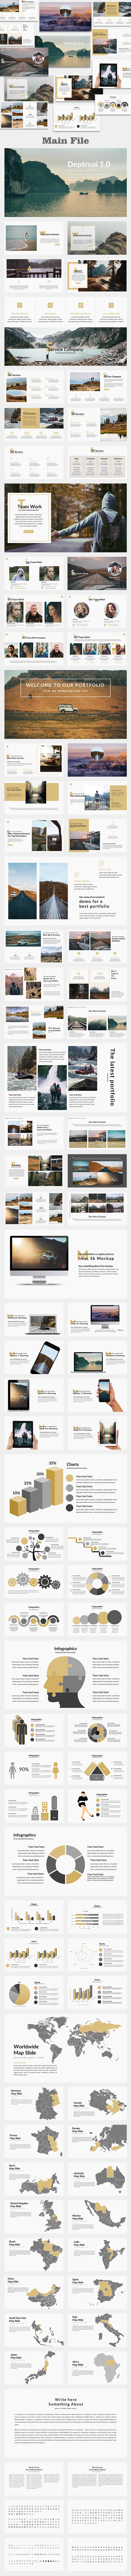 Deptroai 1.0 Multipurpose PowerPoint Template - Creative PowerPoint Templates